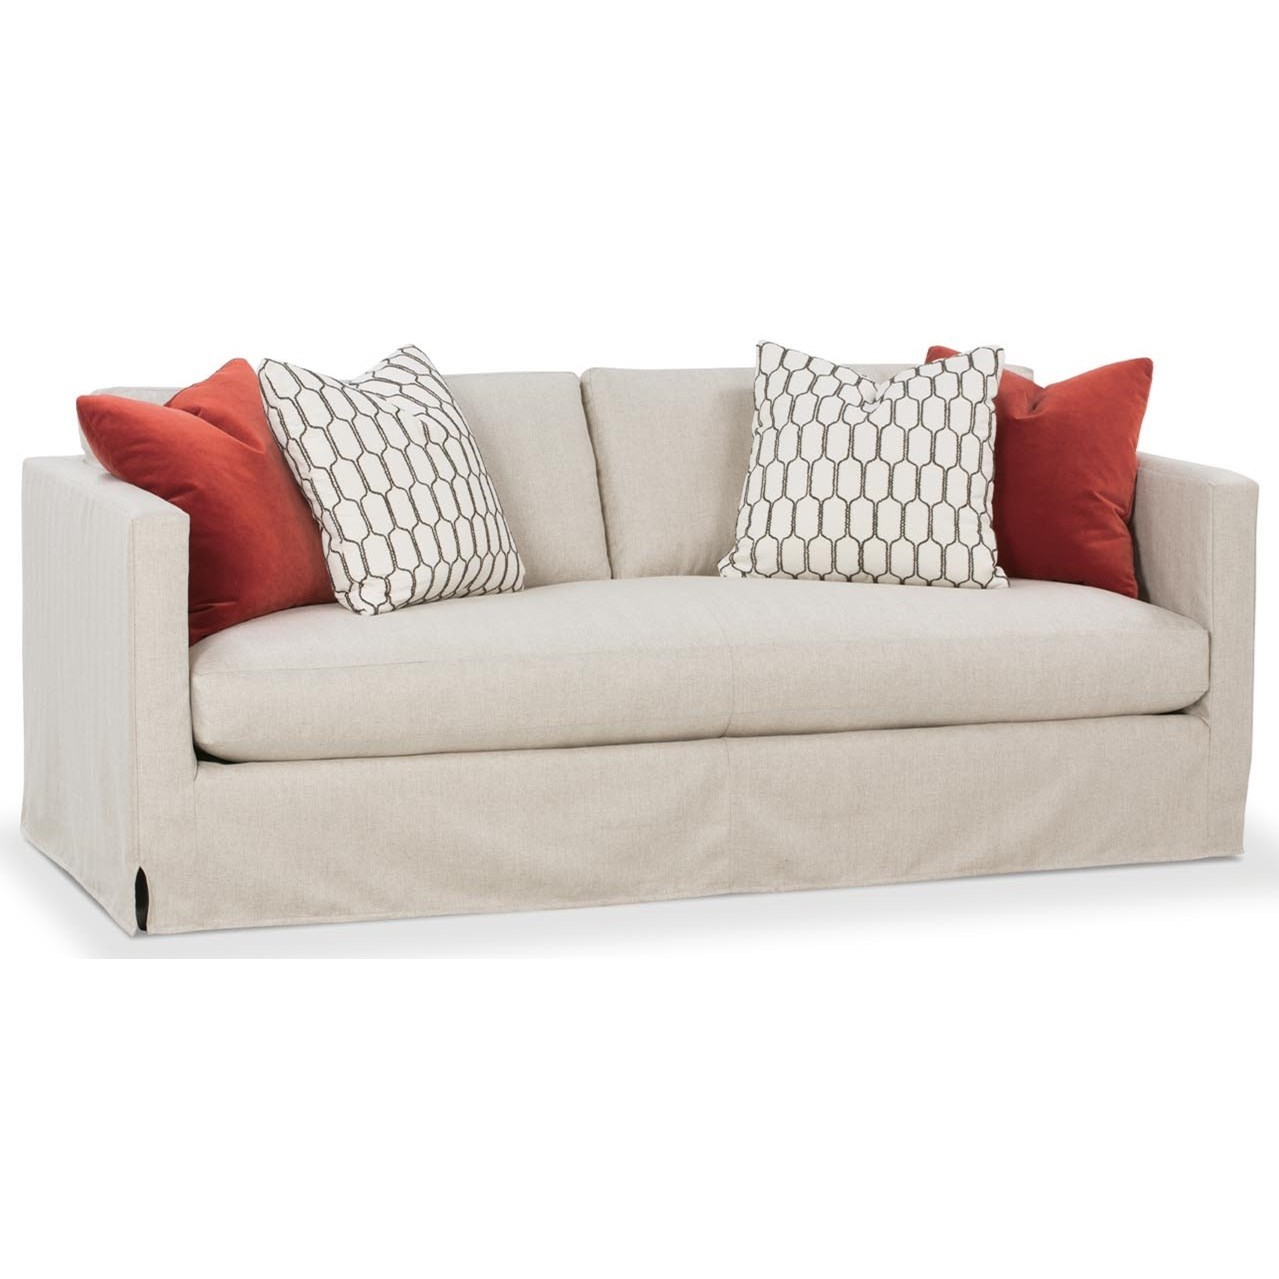 bruce hales furniture business plan